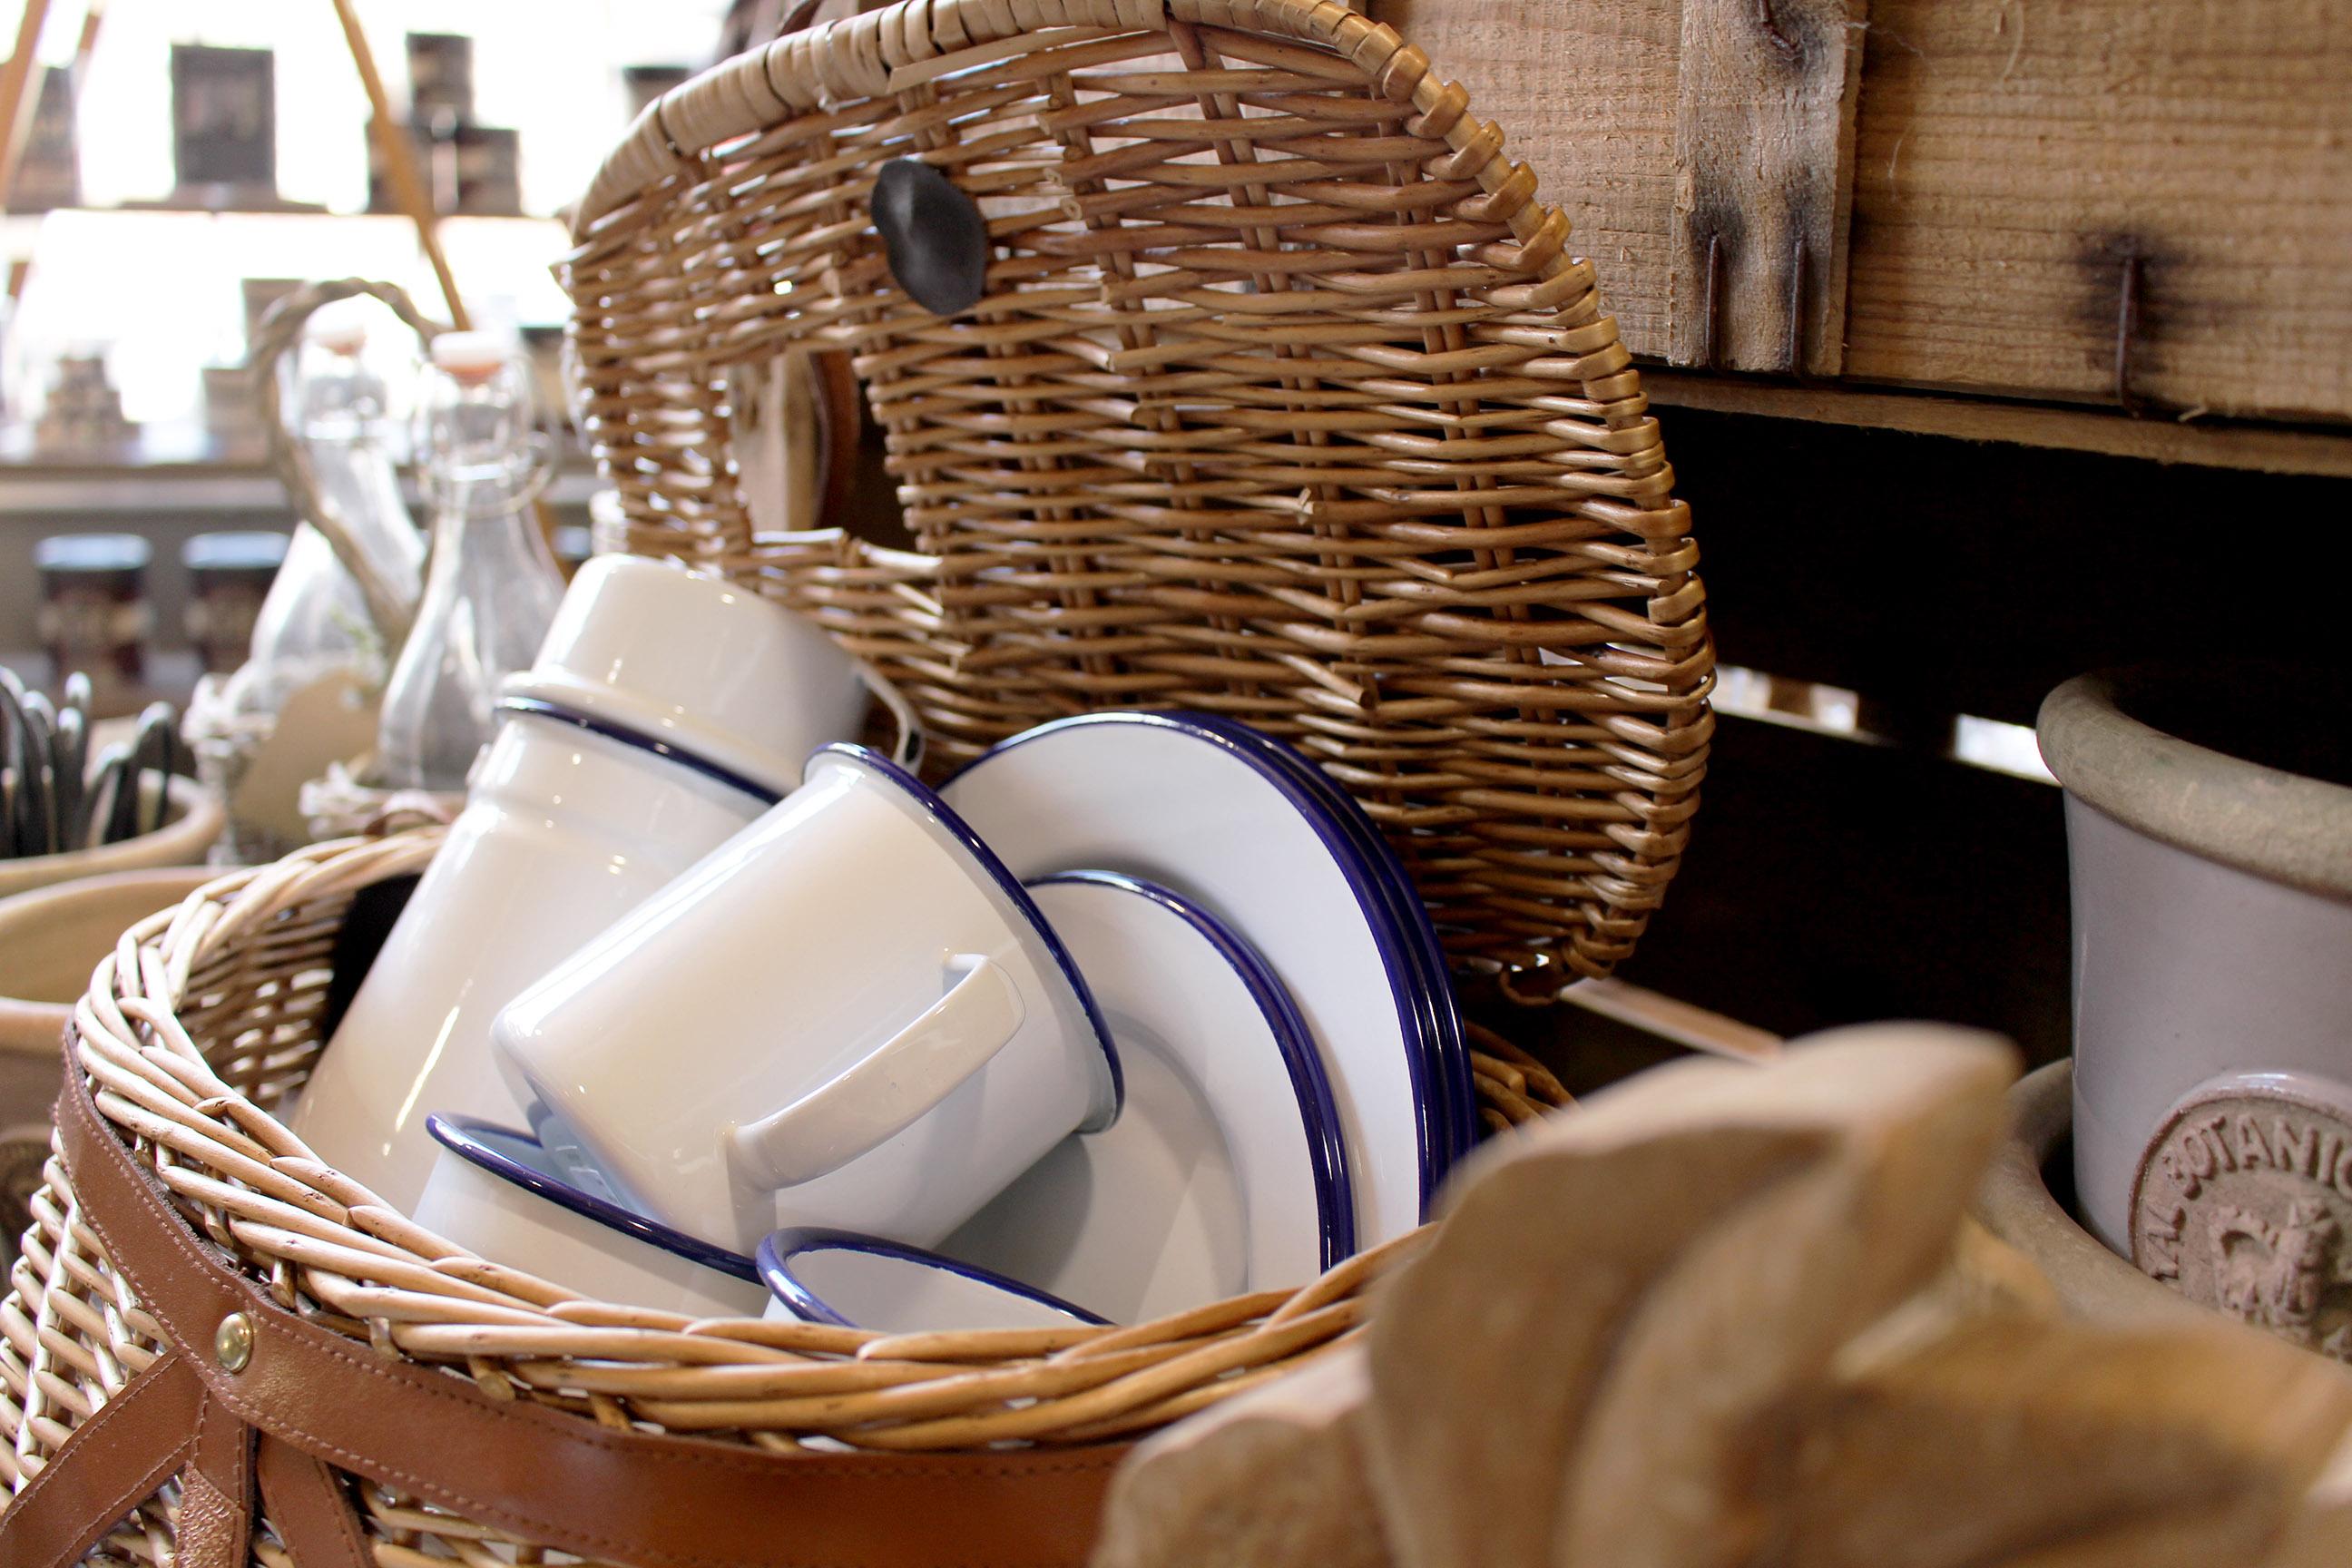 enamel plates and crockery